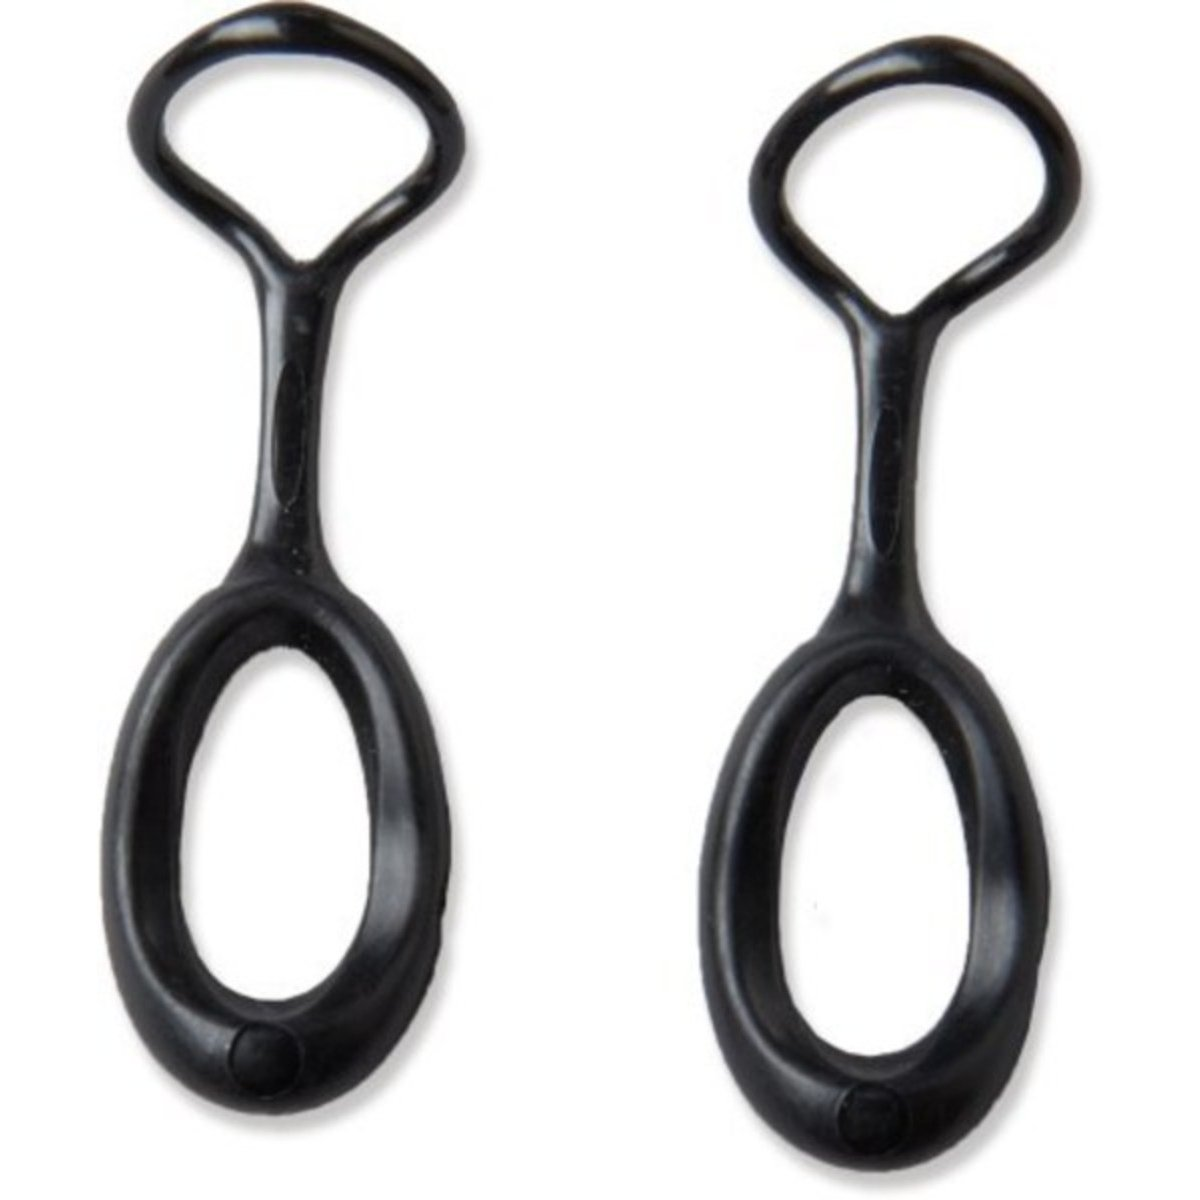 Gear Aid Ergo Zipper Pulls for Outdoor Packs Gear Repair Sporting Good - Black